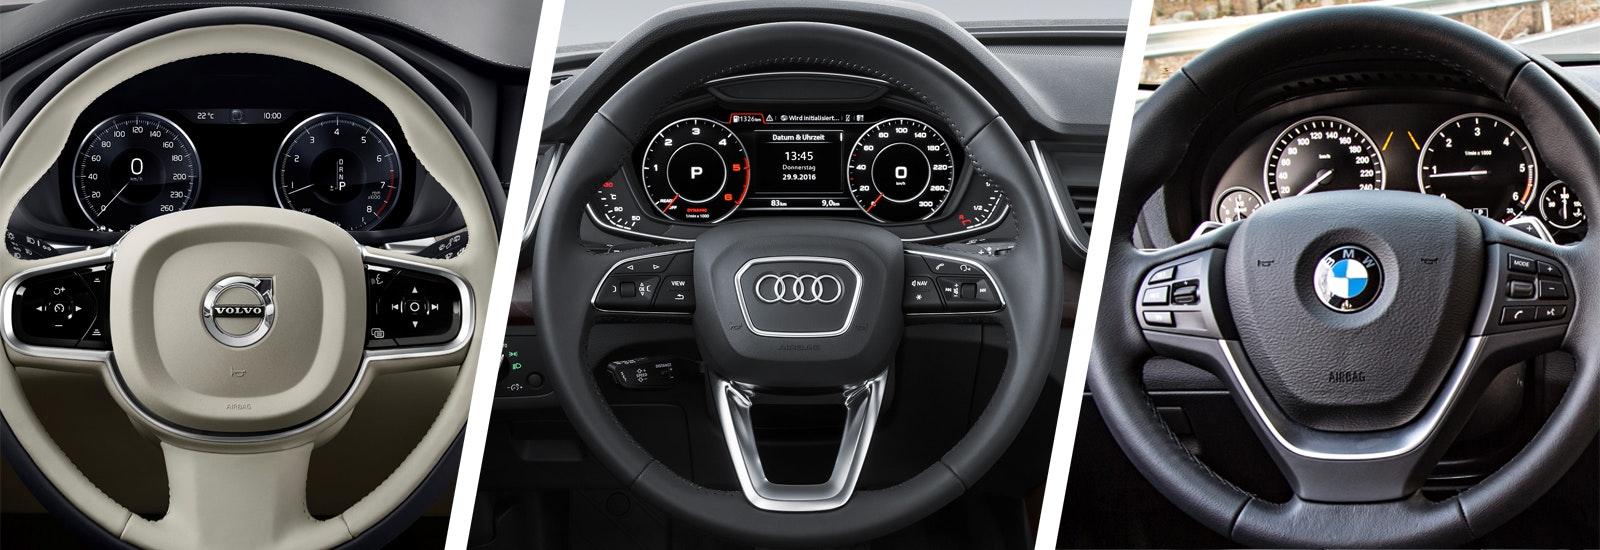 Volvo Xc60 Vs Audi Q5 Vs Bmw X3 Suv Comparison Carwow